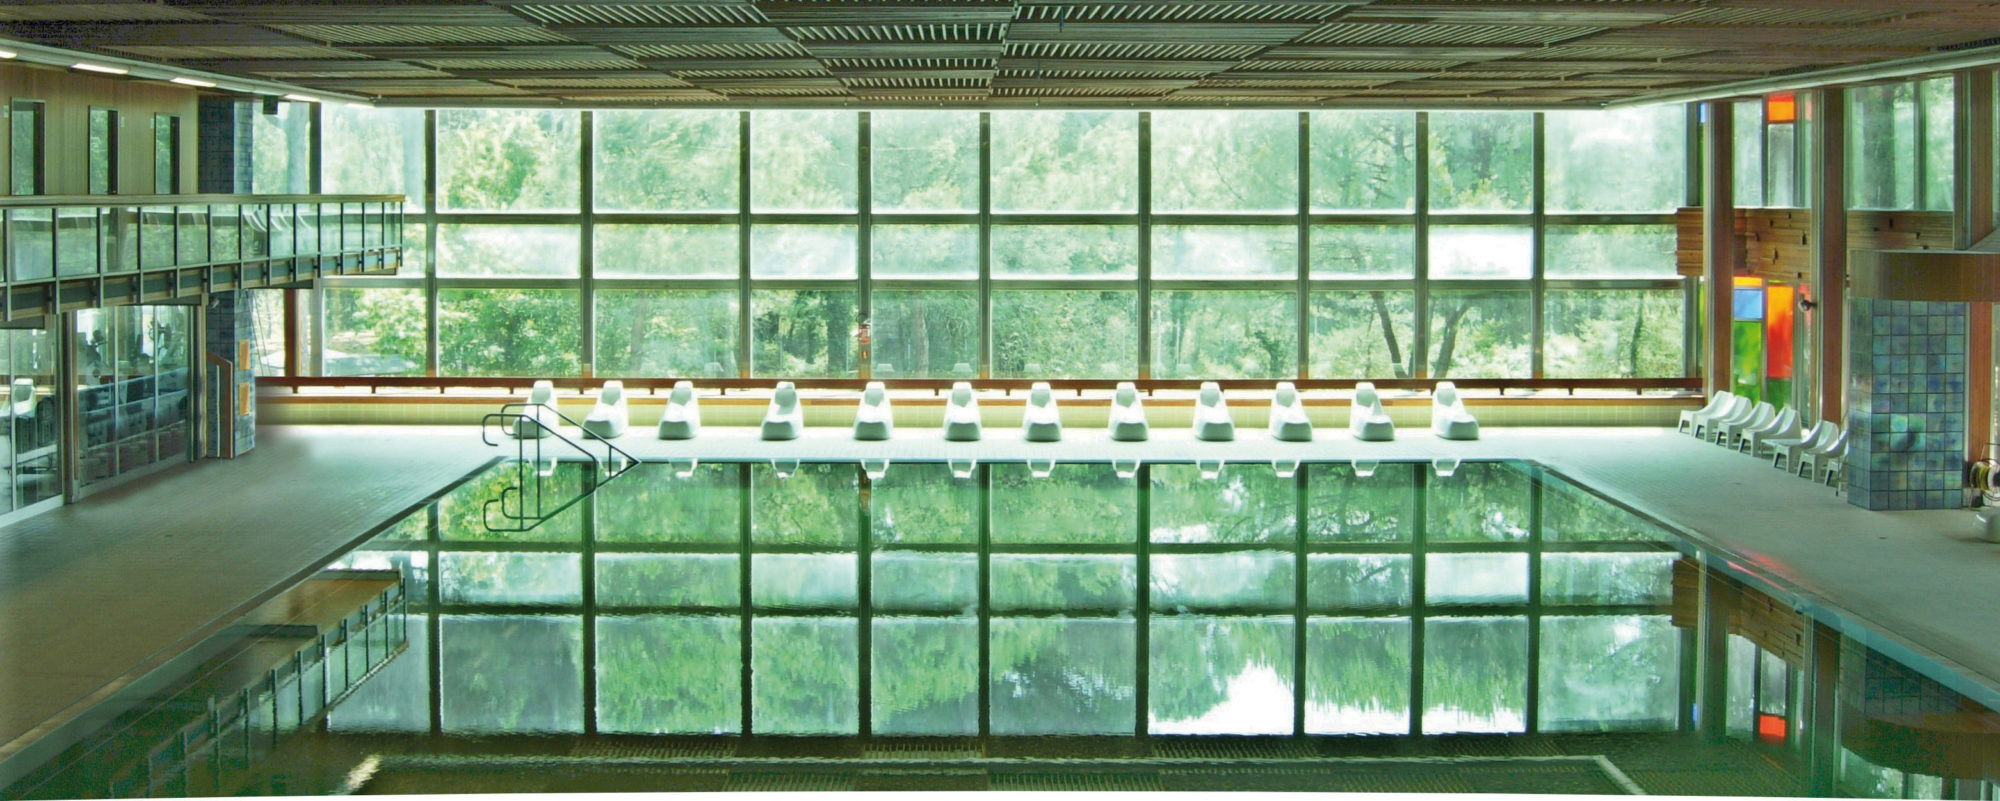 La piscina termale terme di cervia - Piscina di acqui terme ...